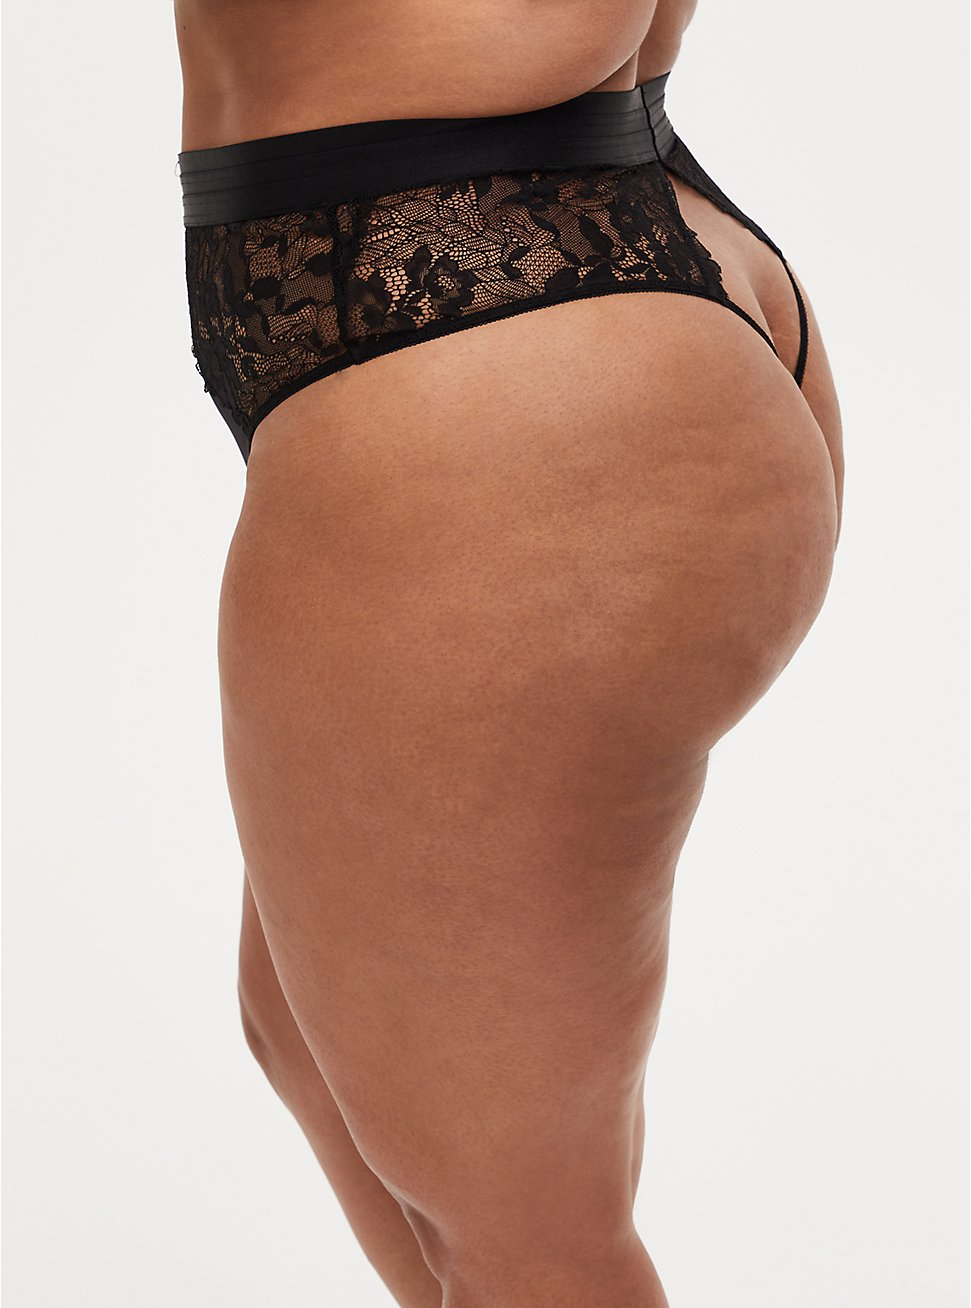 Black Satin & Lace Cutout Back High Waist Thong Panty , RICH BLACK, hi-res